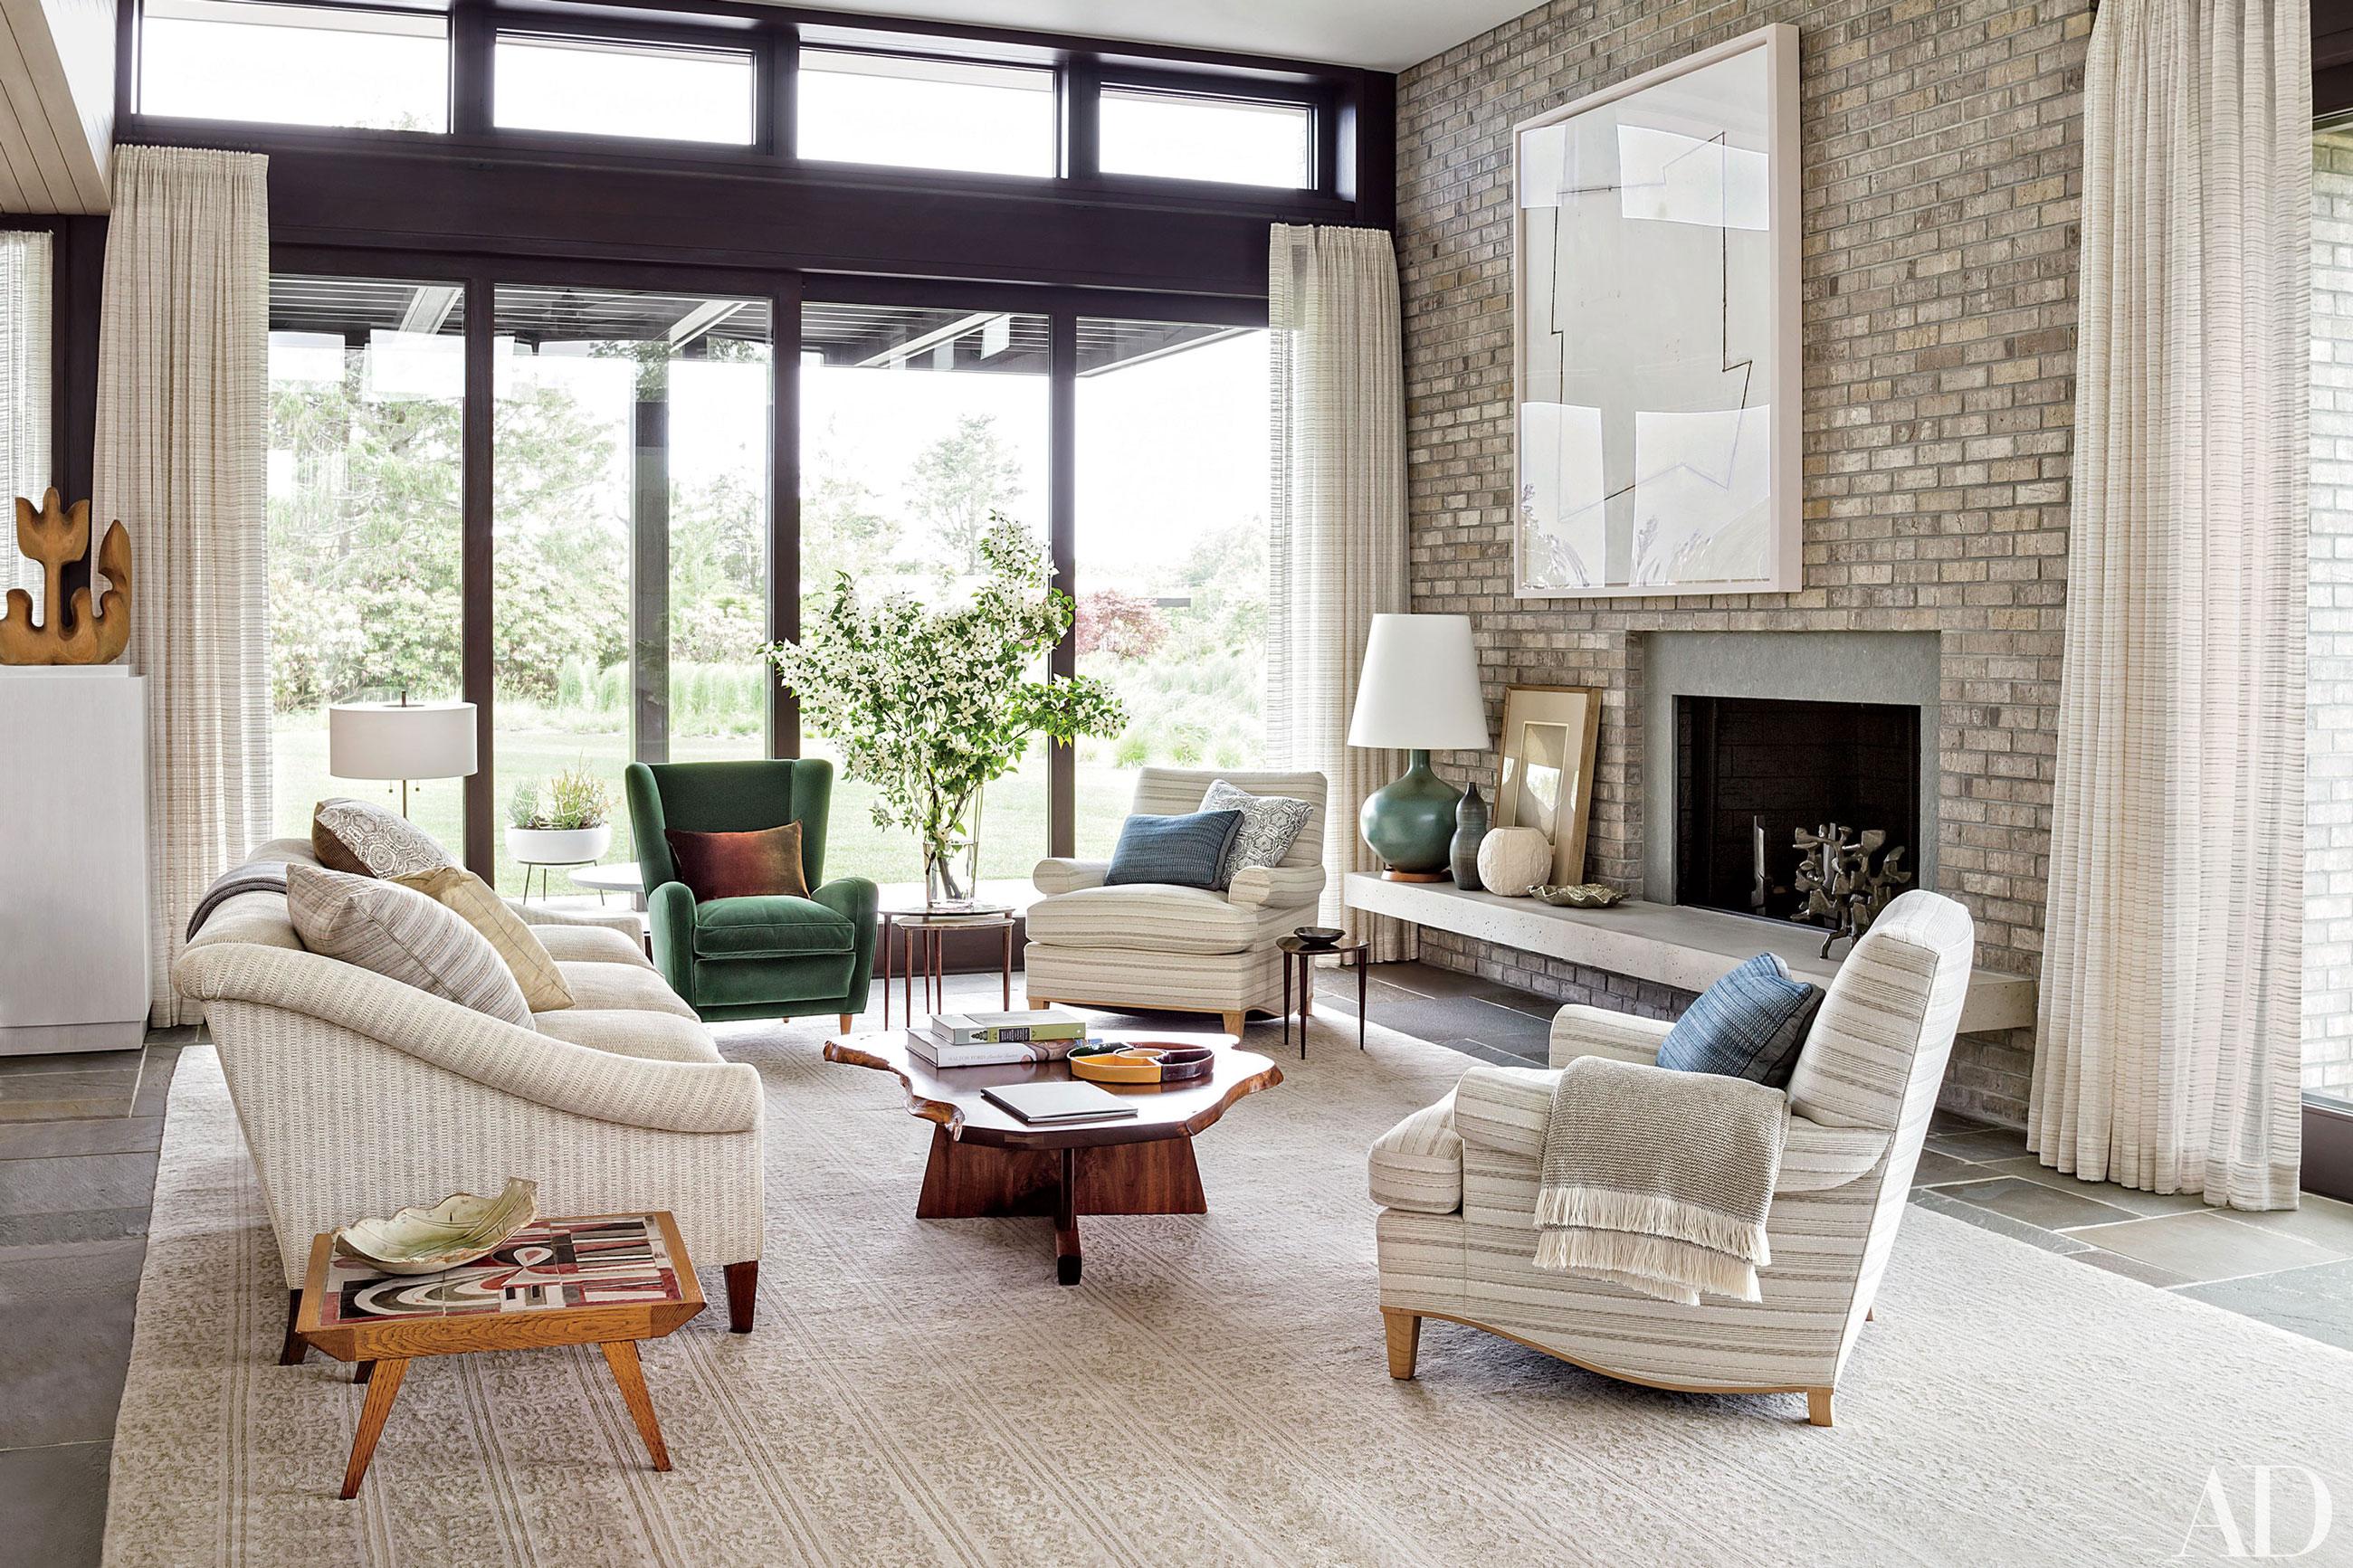 Choosing a Home Window Tint Solution